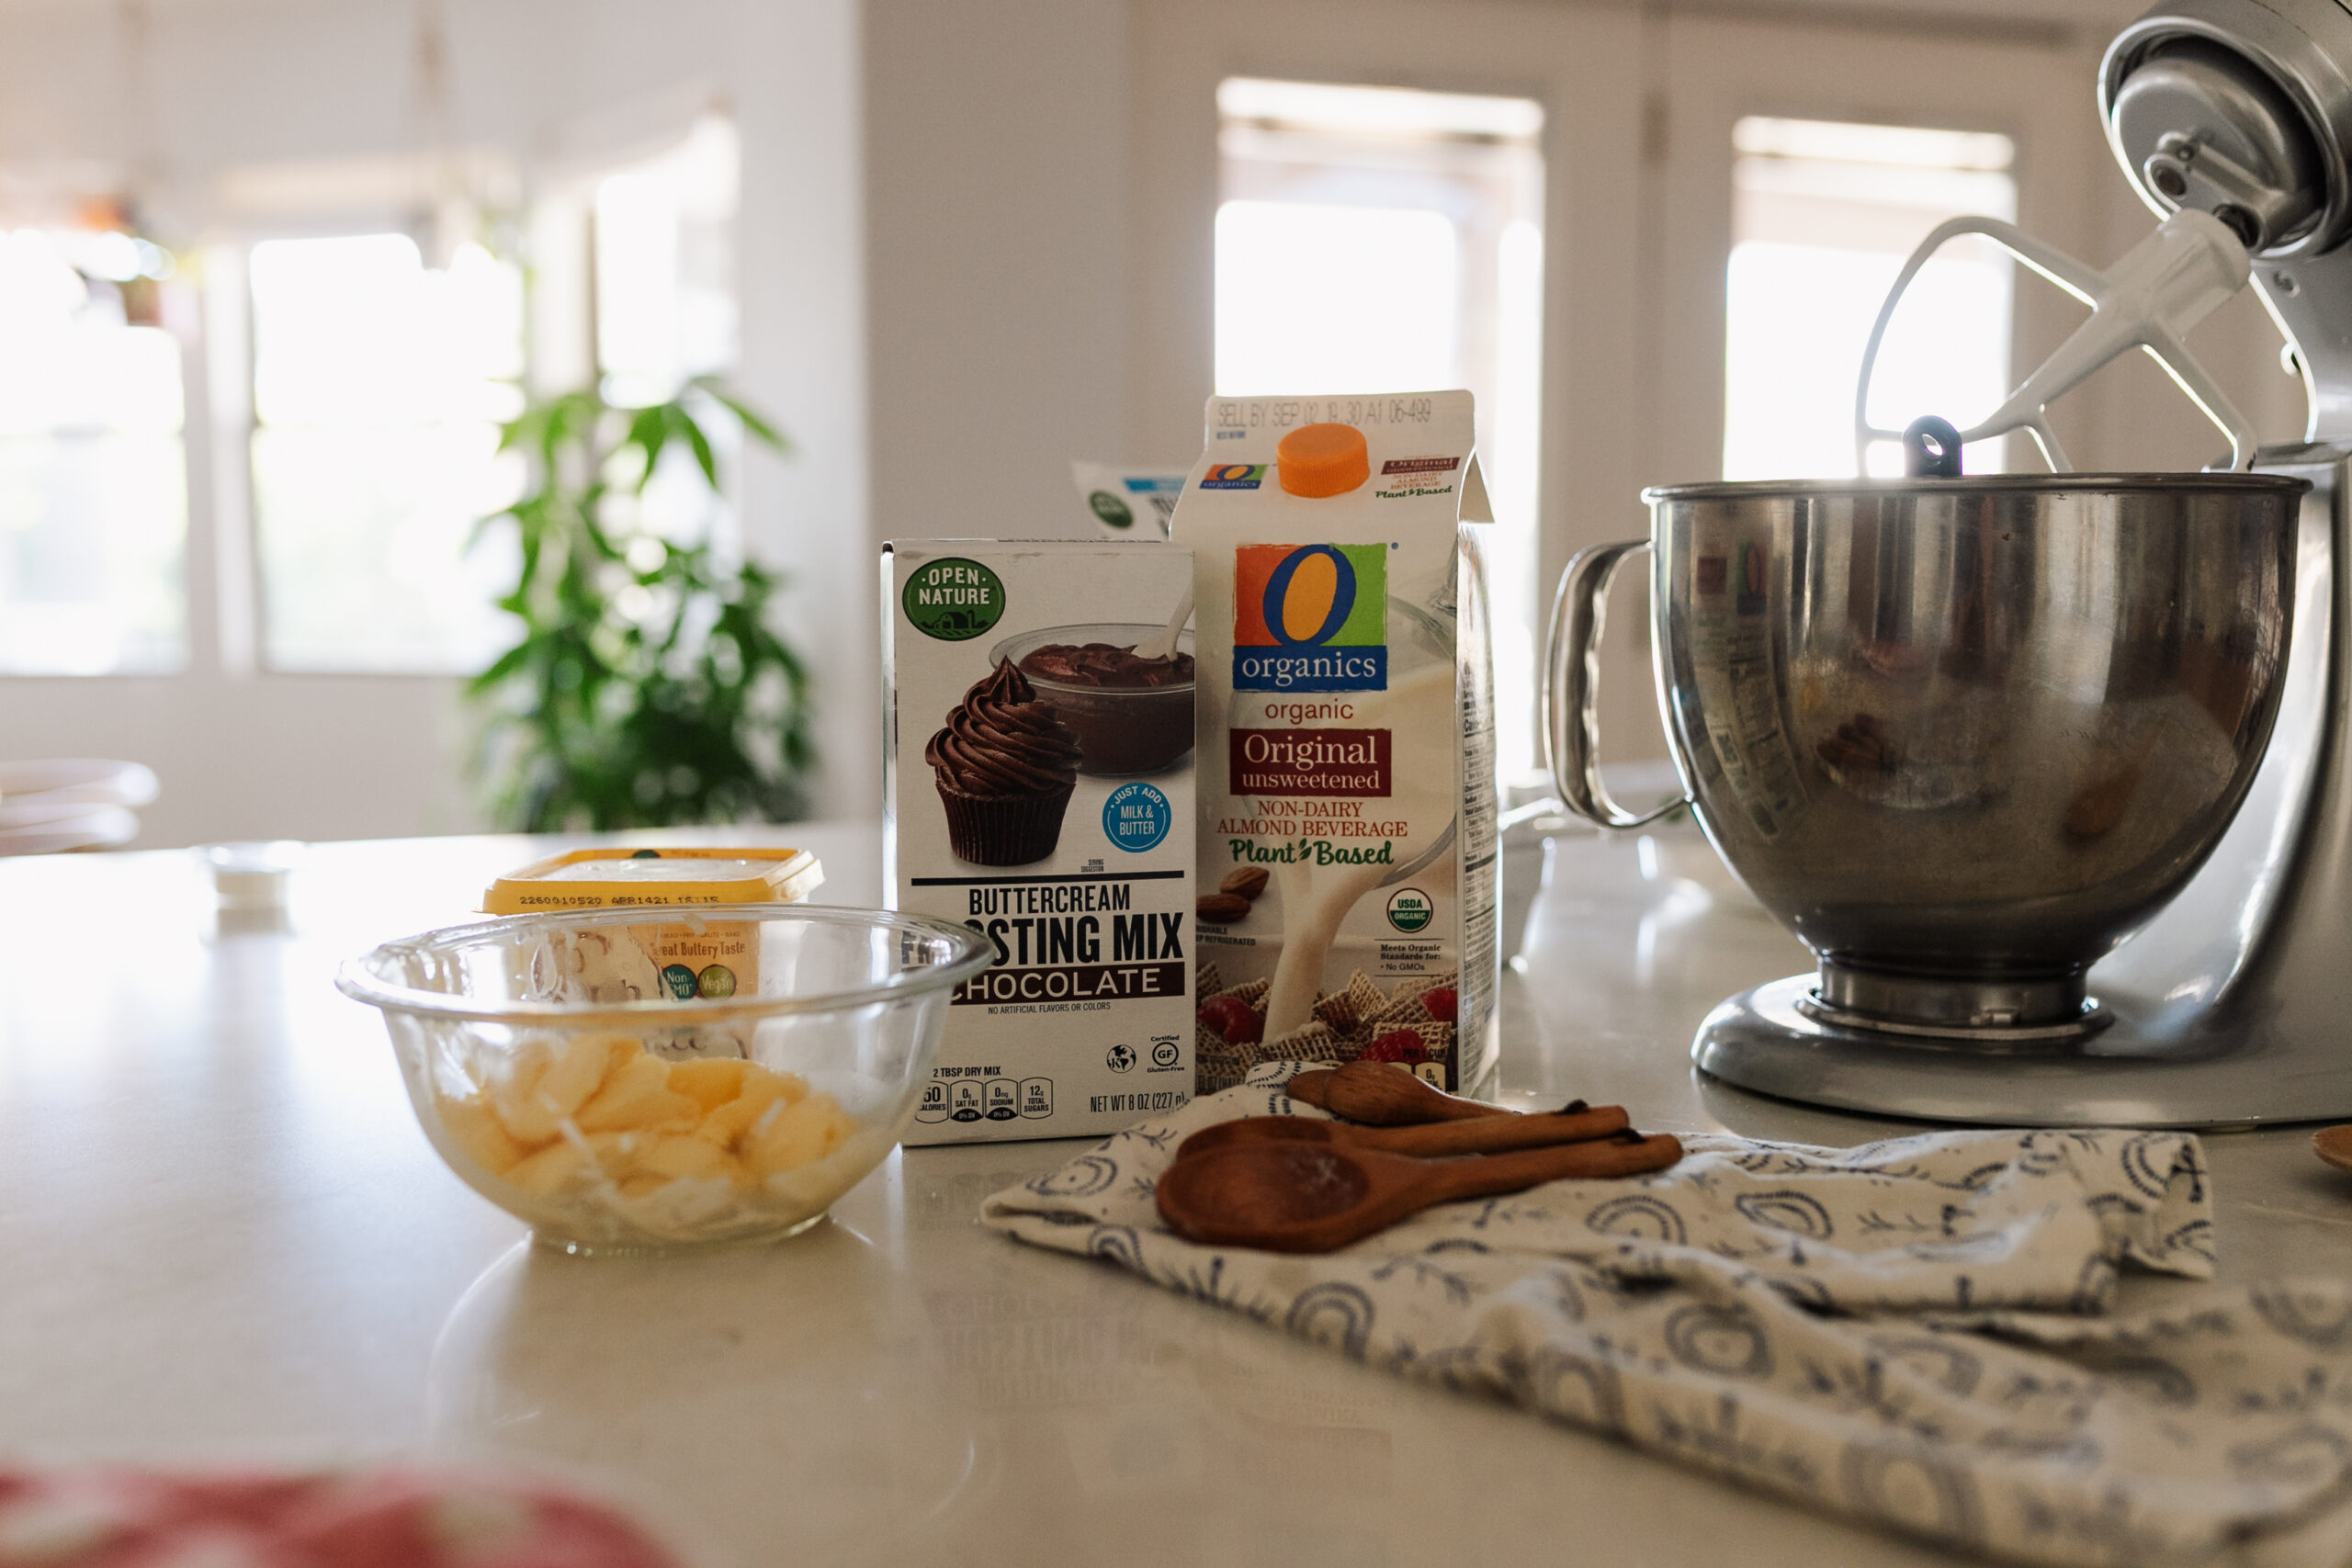 ready to make vegan buttercream chocolate frosting! #oorganics #safeway #vegan #veganbuttercream